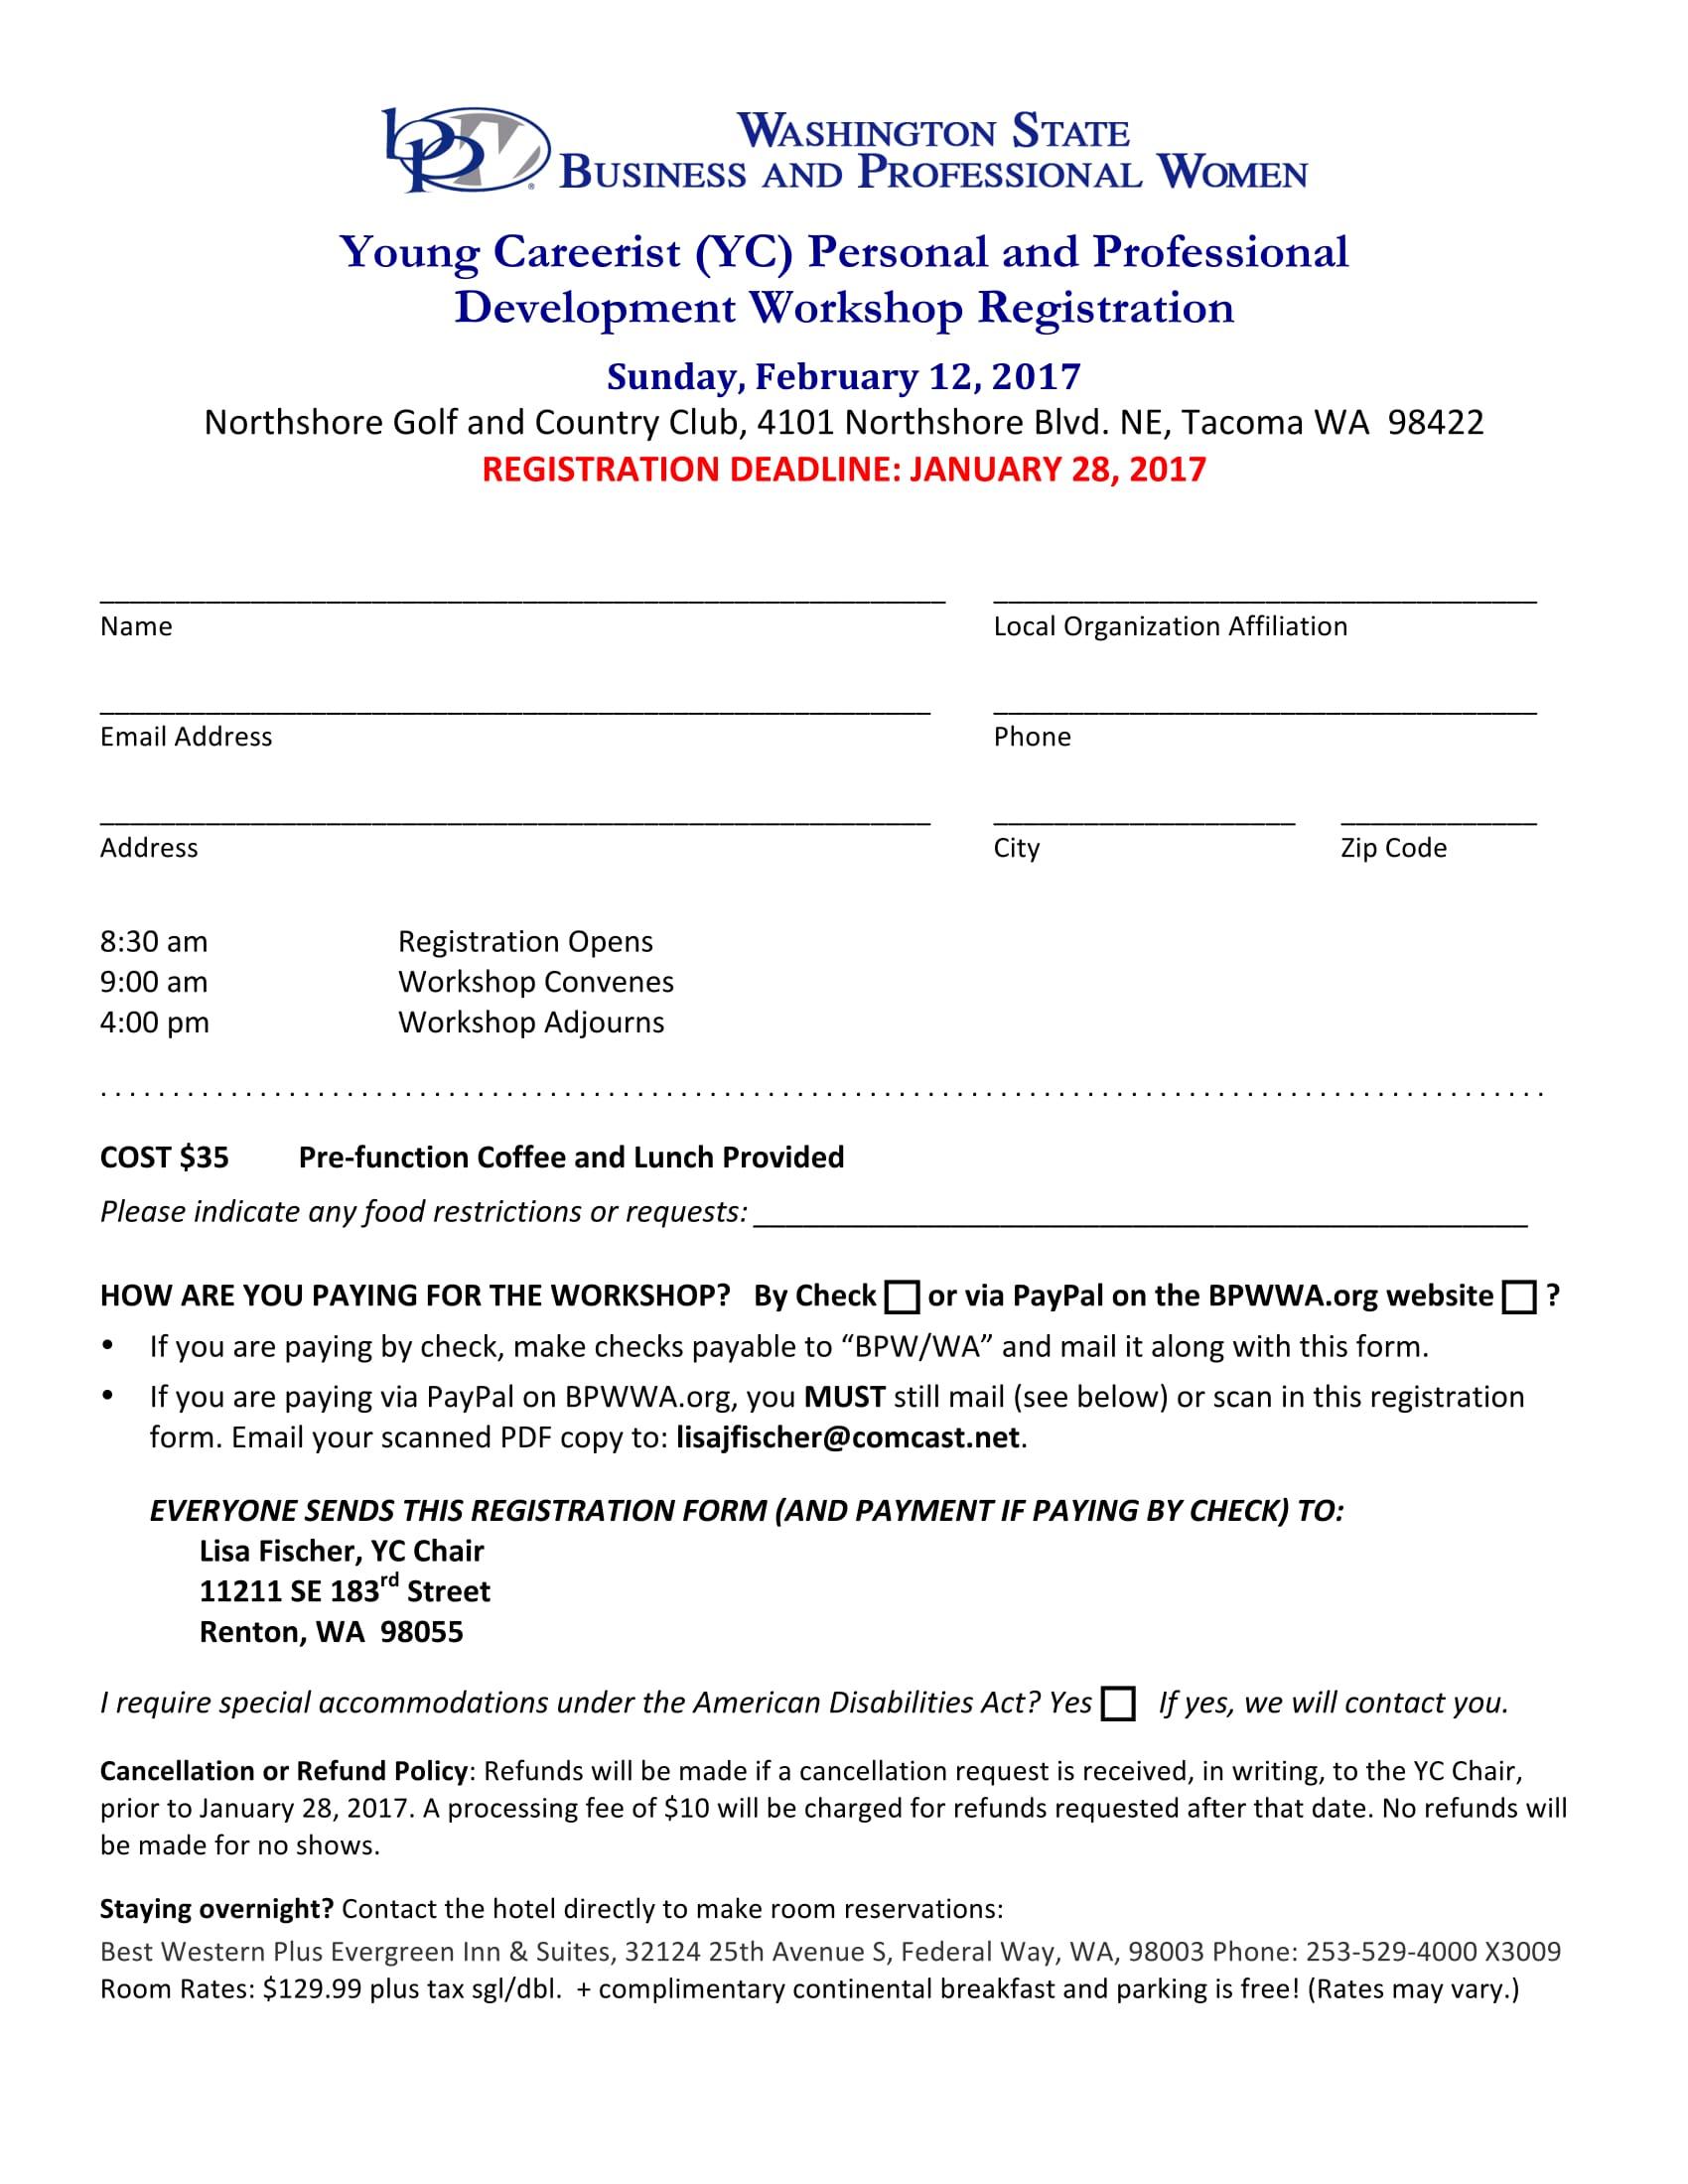 personal professional development workshop registration 1